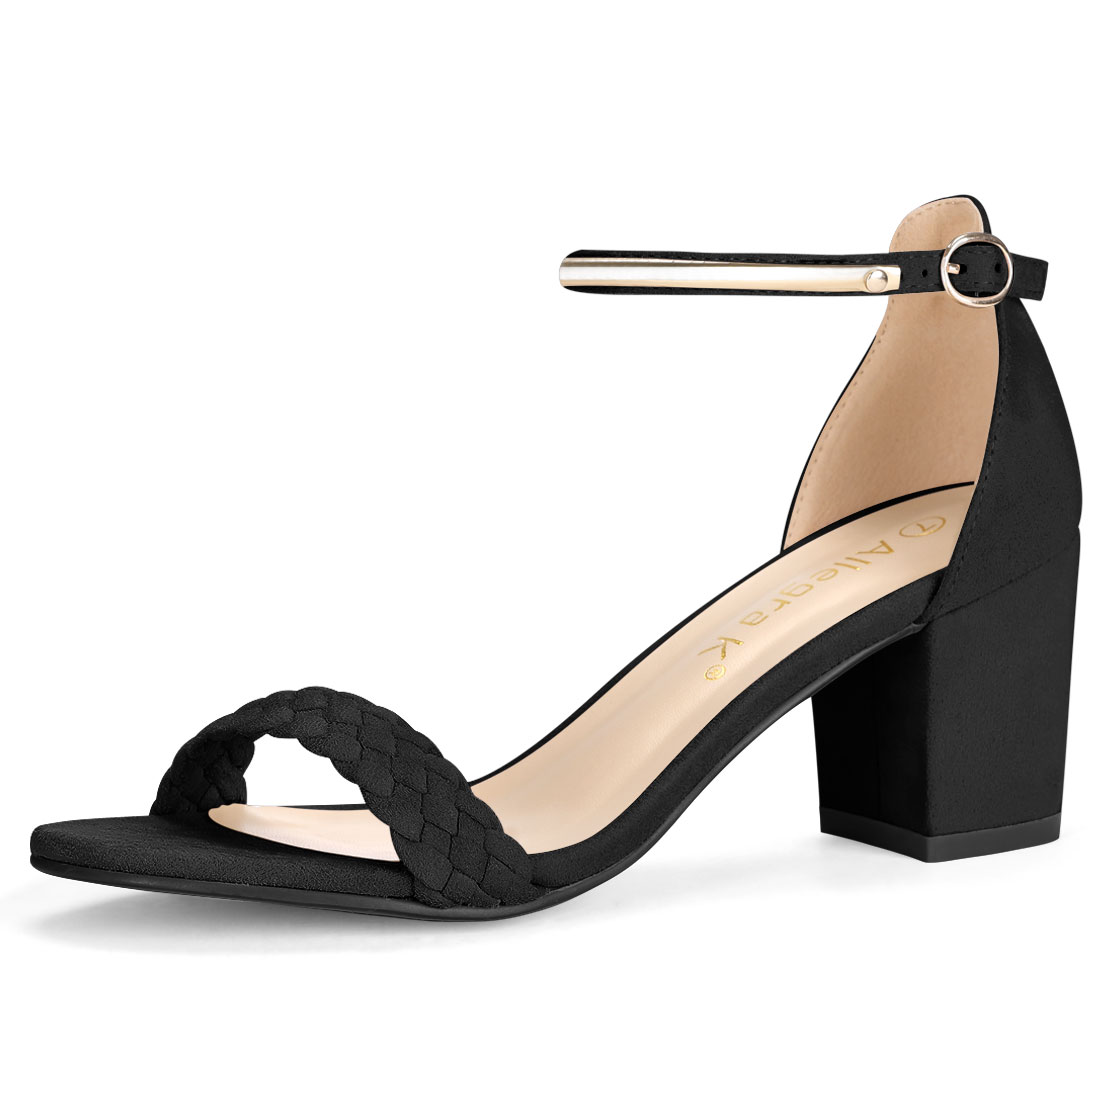 Women Open Toe Mid Heel Braided Ankle Strap Sandals Black US 5